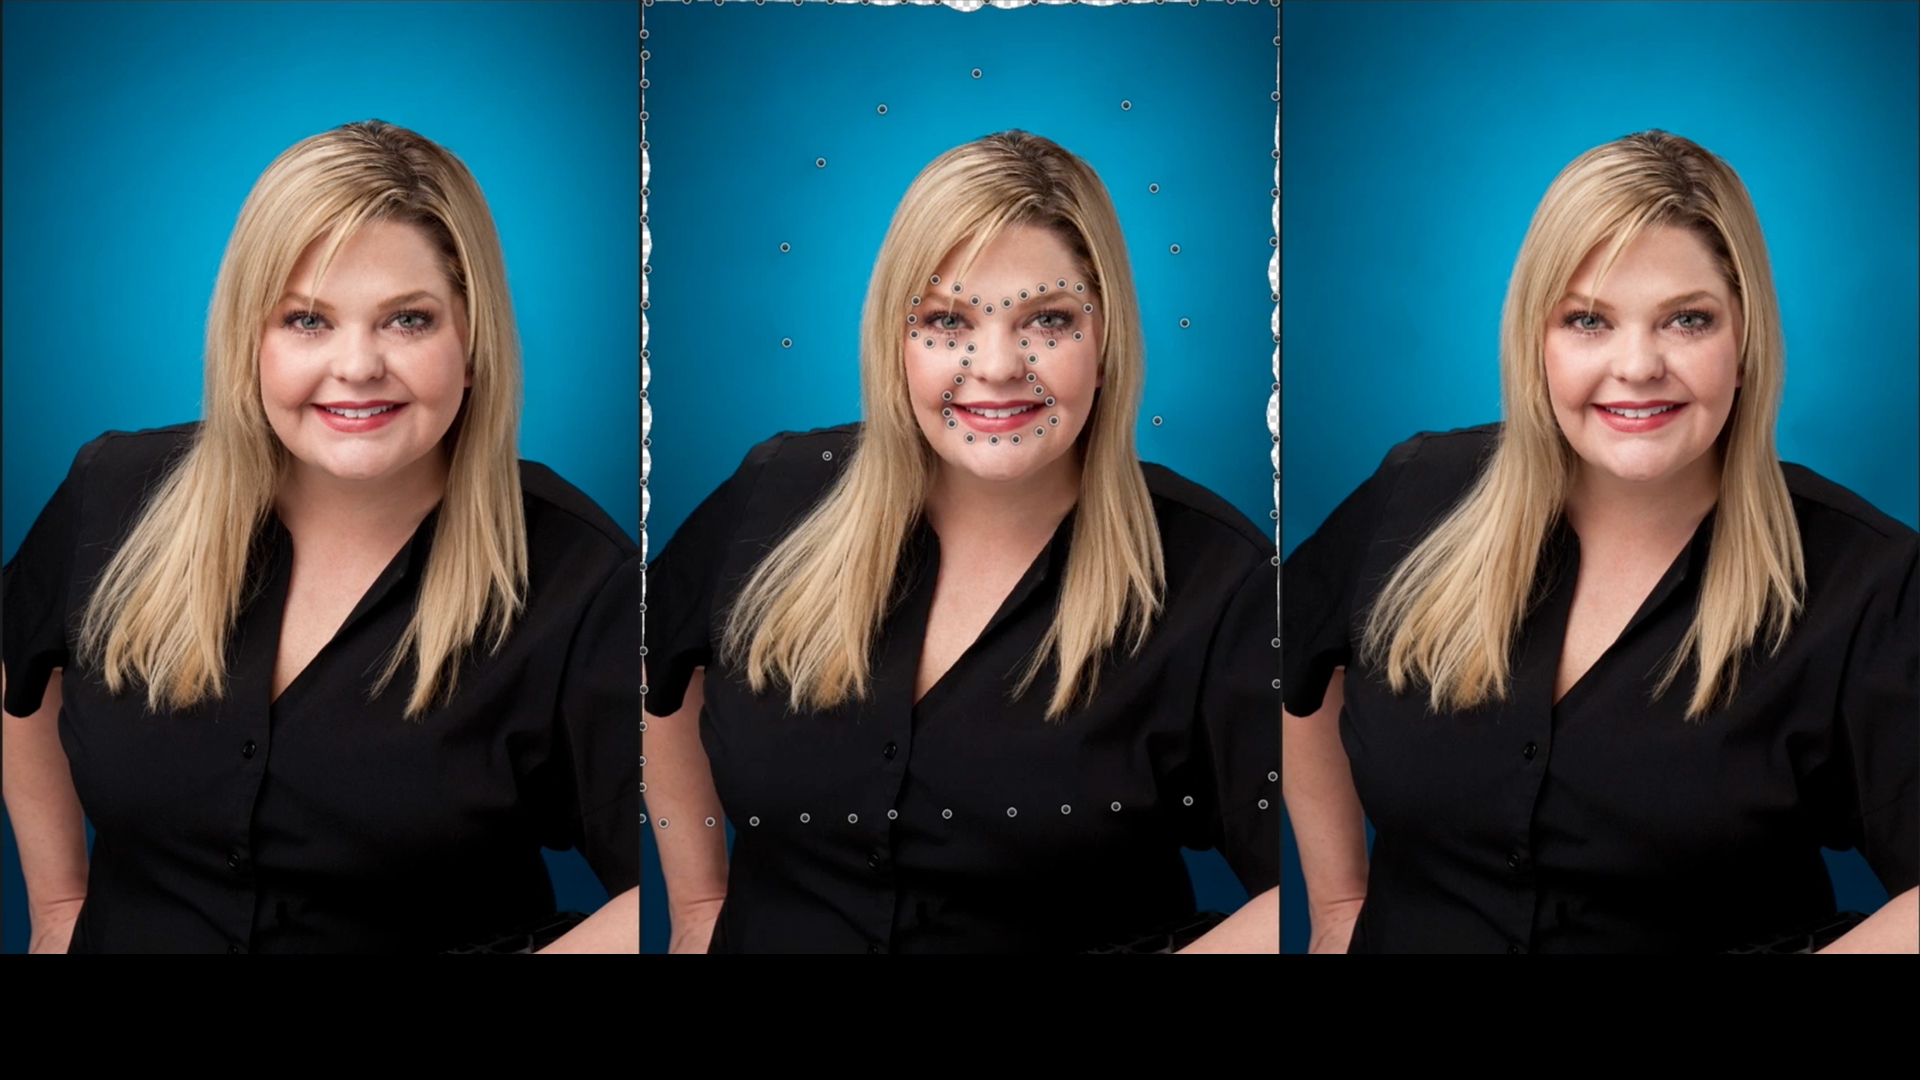 Photofocus photoshops puppet warp slims a face photoshops puppet warp slims a face baditri Image collections